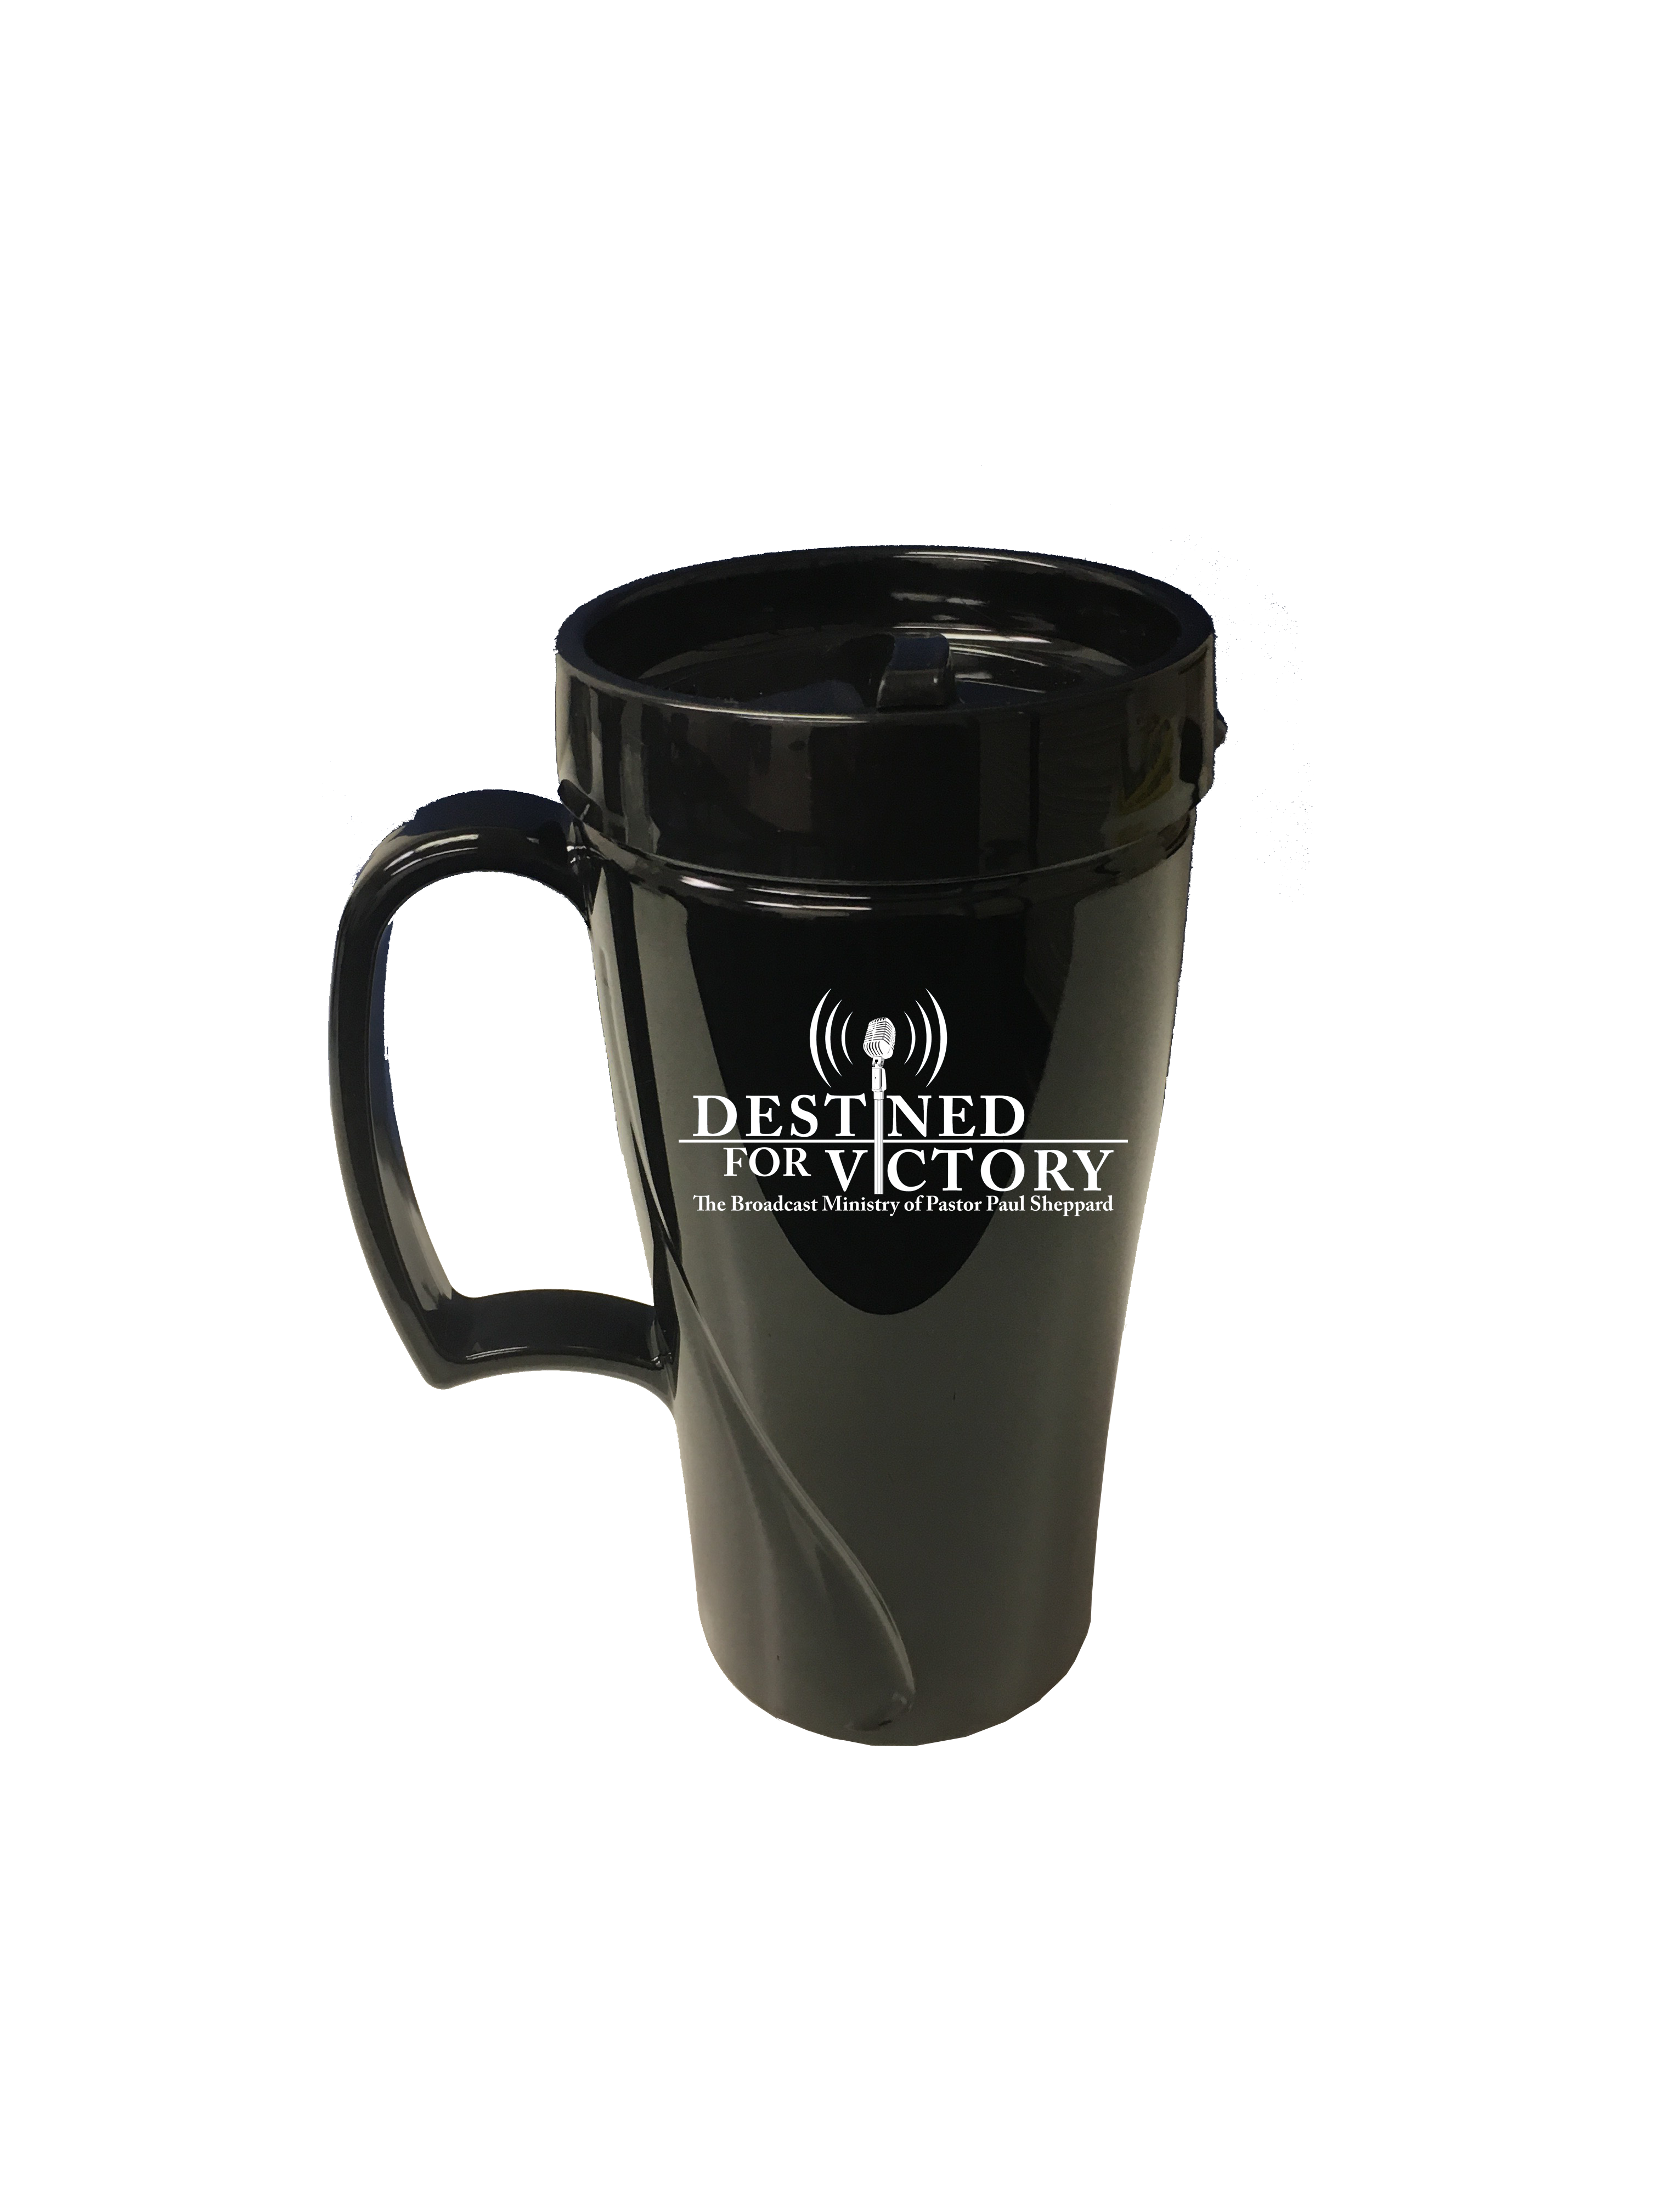 Destined for Victory Travel Mug (16 oz black travel mug)